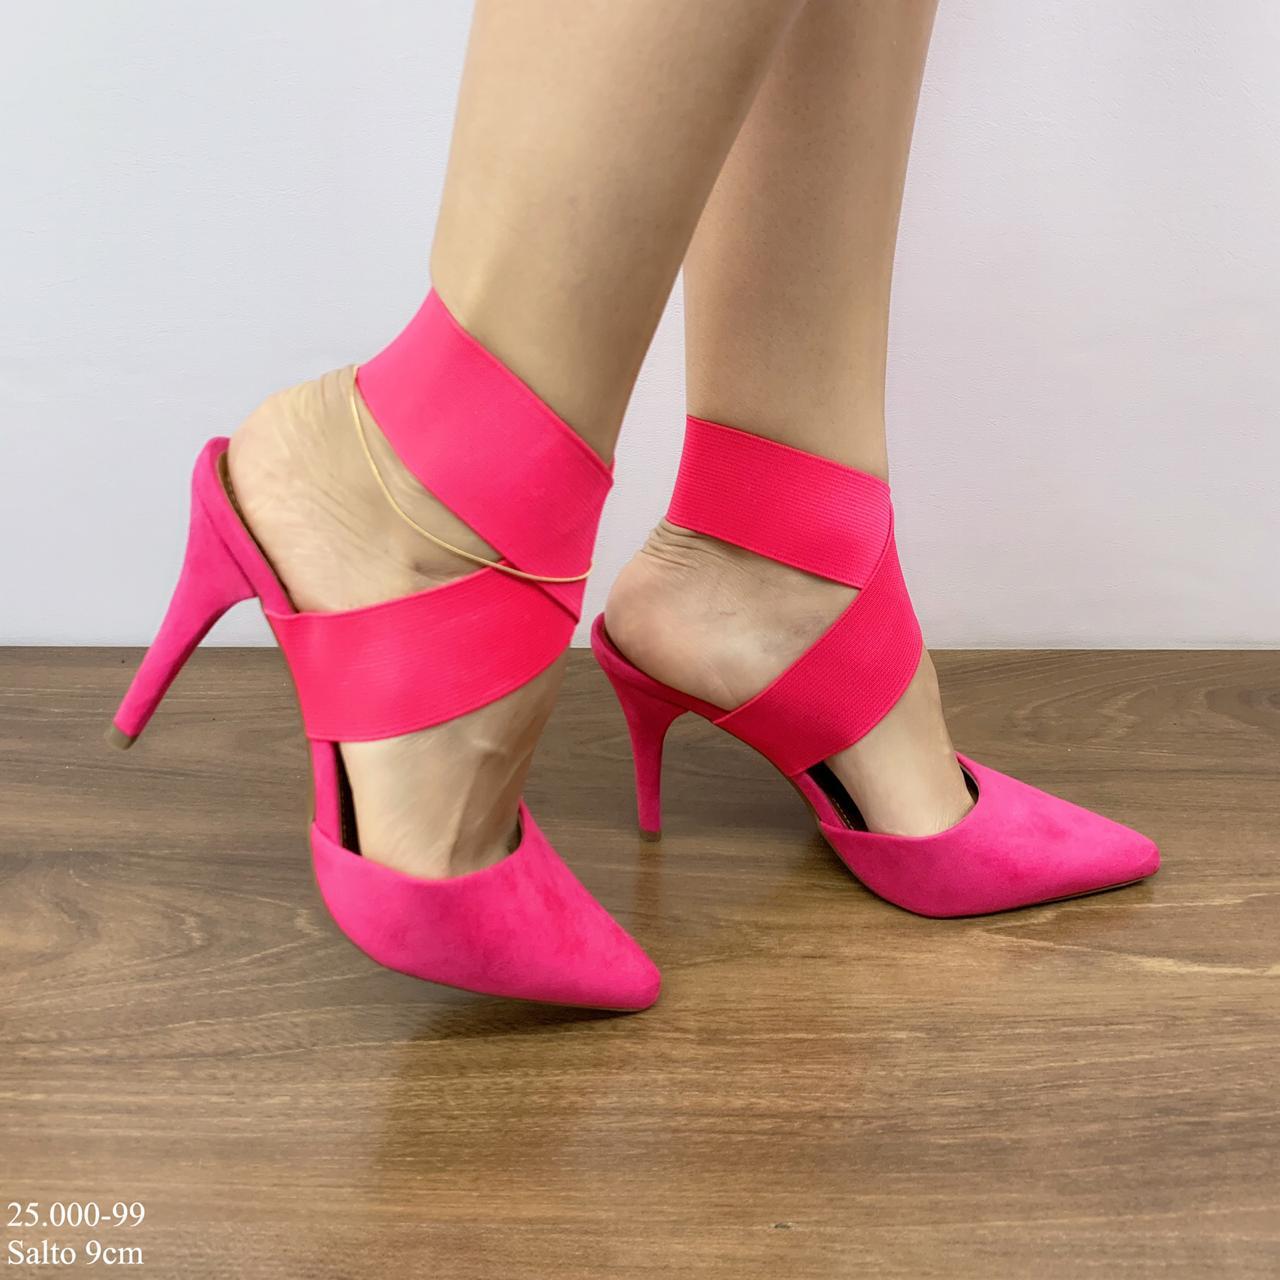 Scarpin Pink Elastico | D- 25.000-99